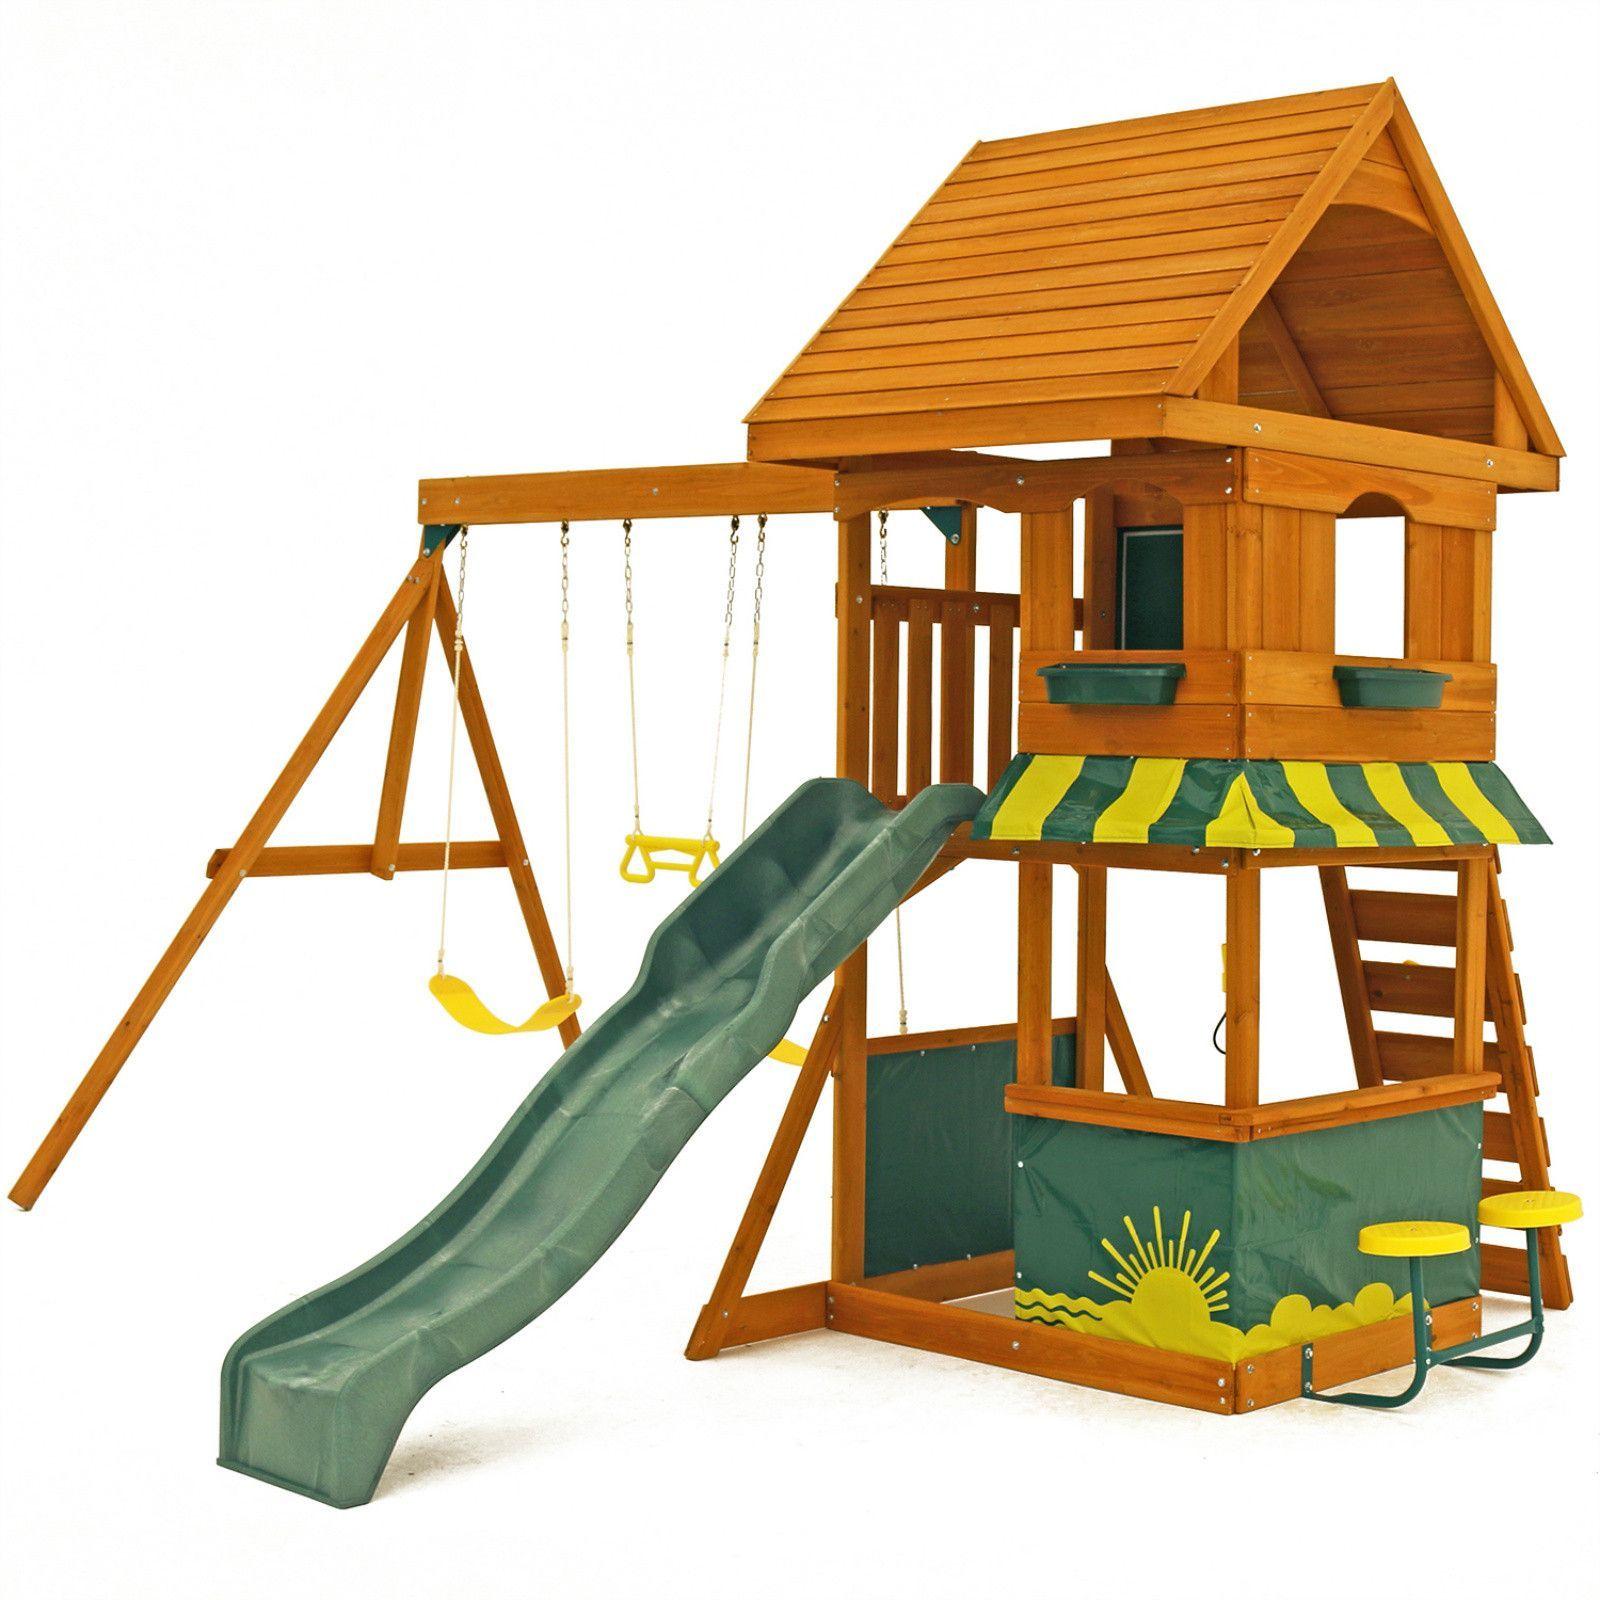 Swing Sets For Backyard Play Houses Build A Playhouse Backyard